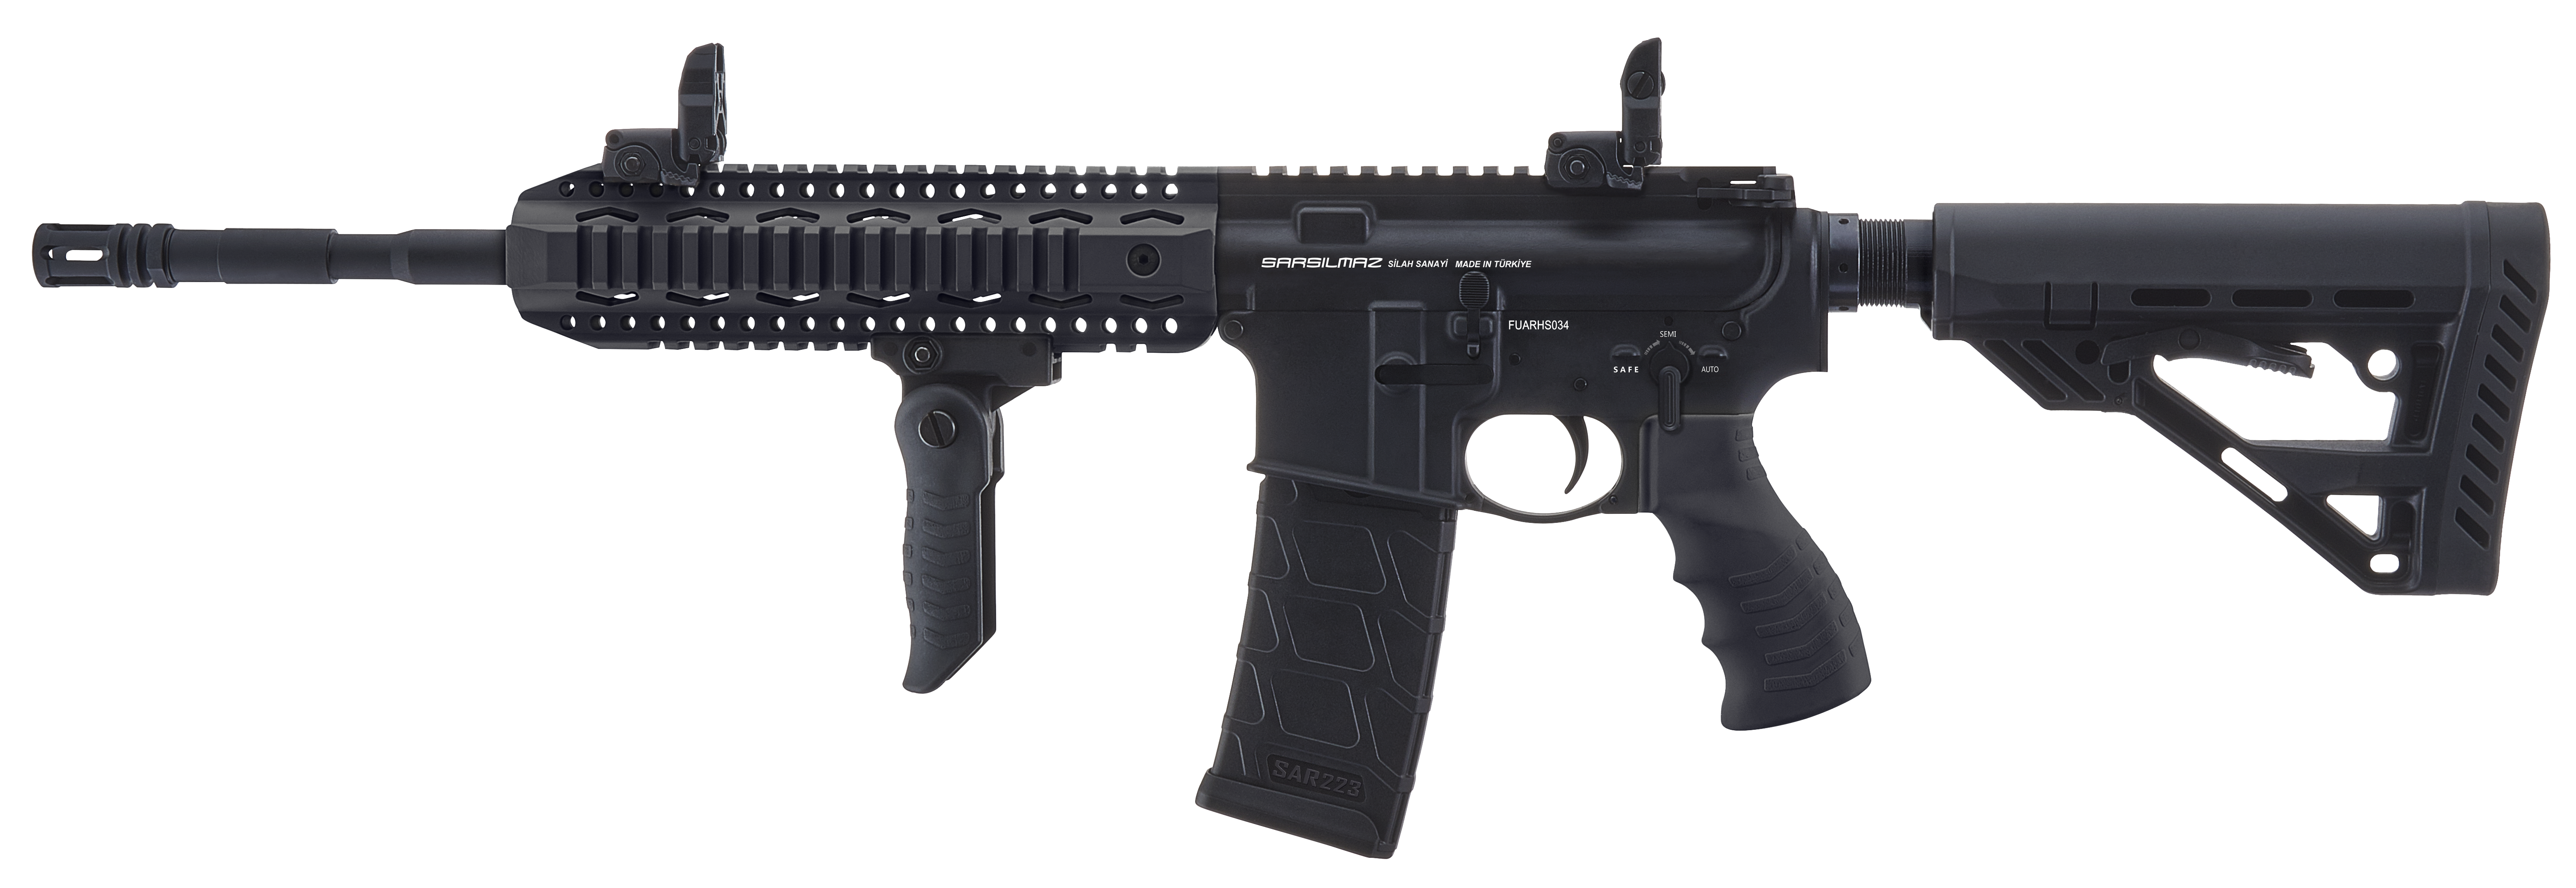 Presentation on emaze pistols. Clipart gun submachine gun